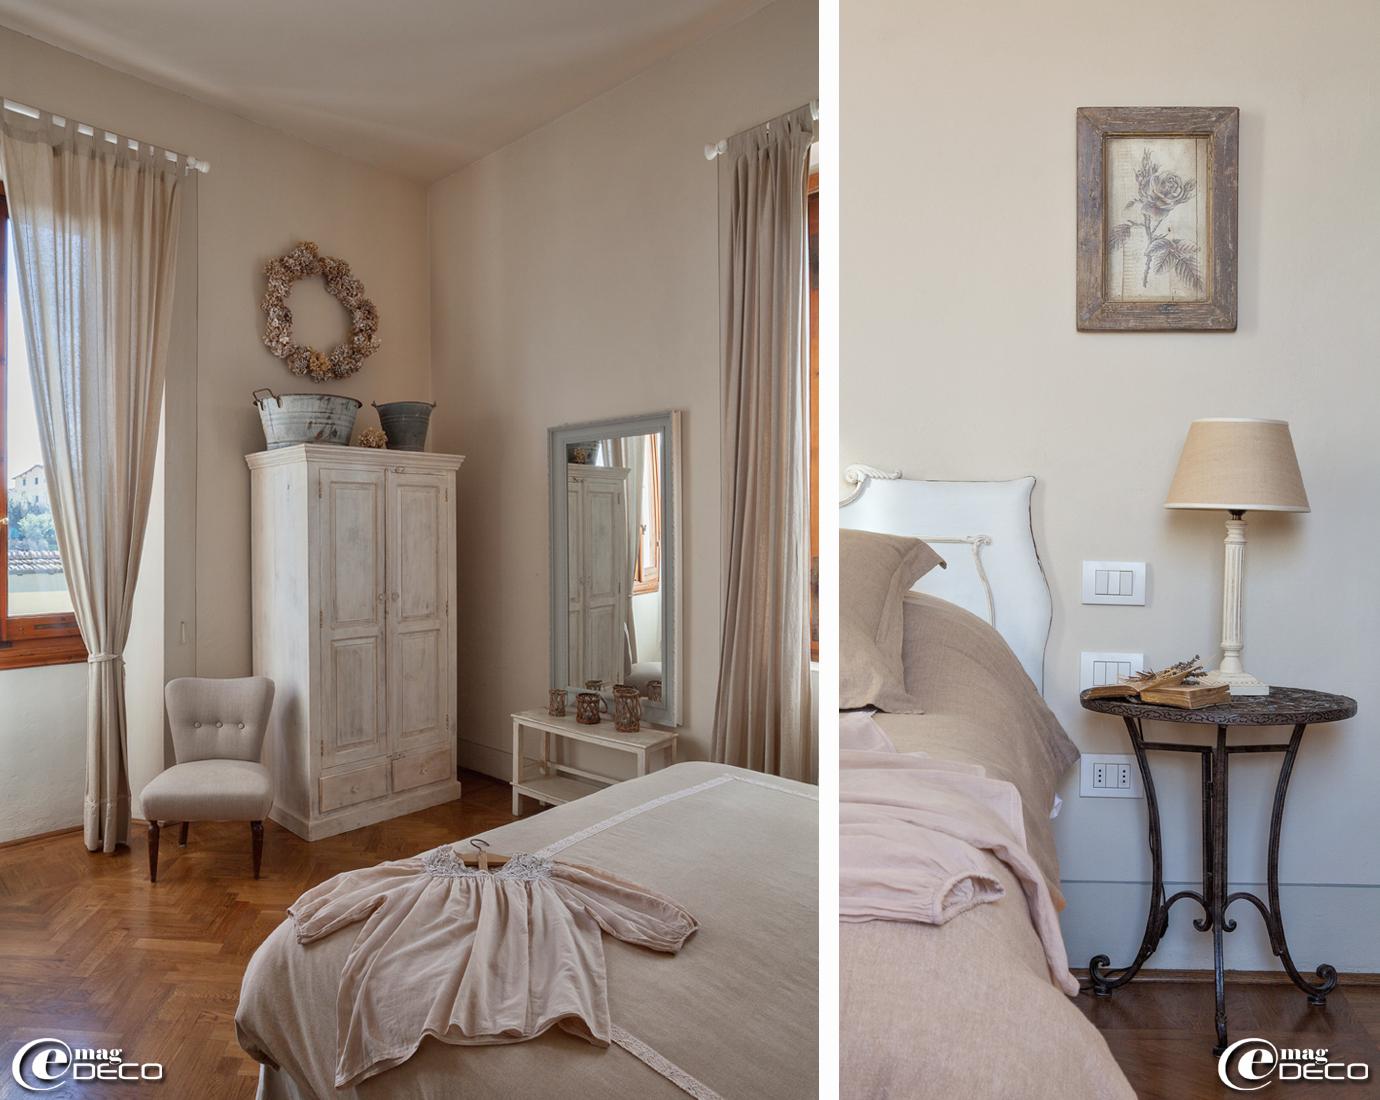 valdirose e magdeco magazine de d coration. Black Bedroom Furniture Sets. Home Design Ideas